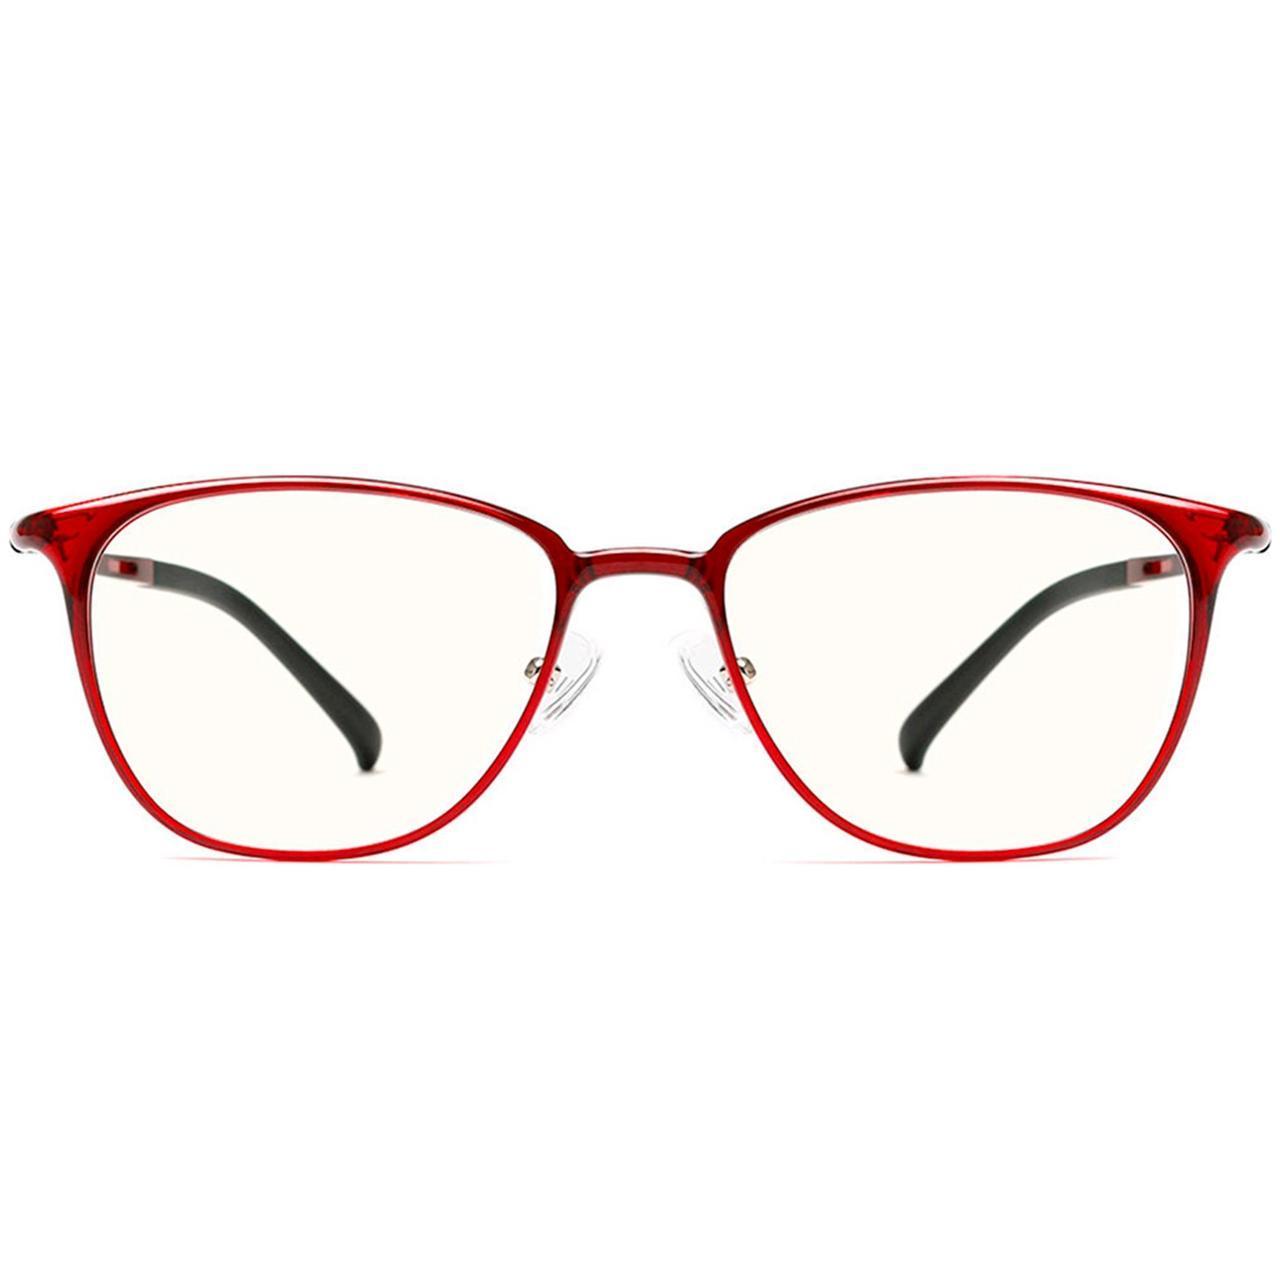 Компьютерные очки Xiaomi Turok Steinhardt Anti Blue Glasses Red (FU009-0621)